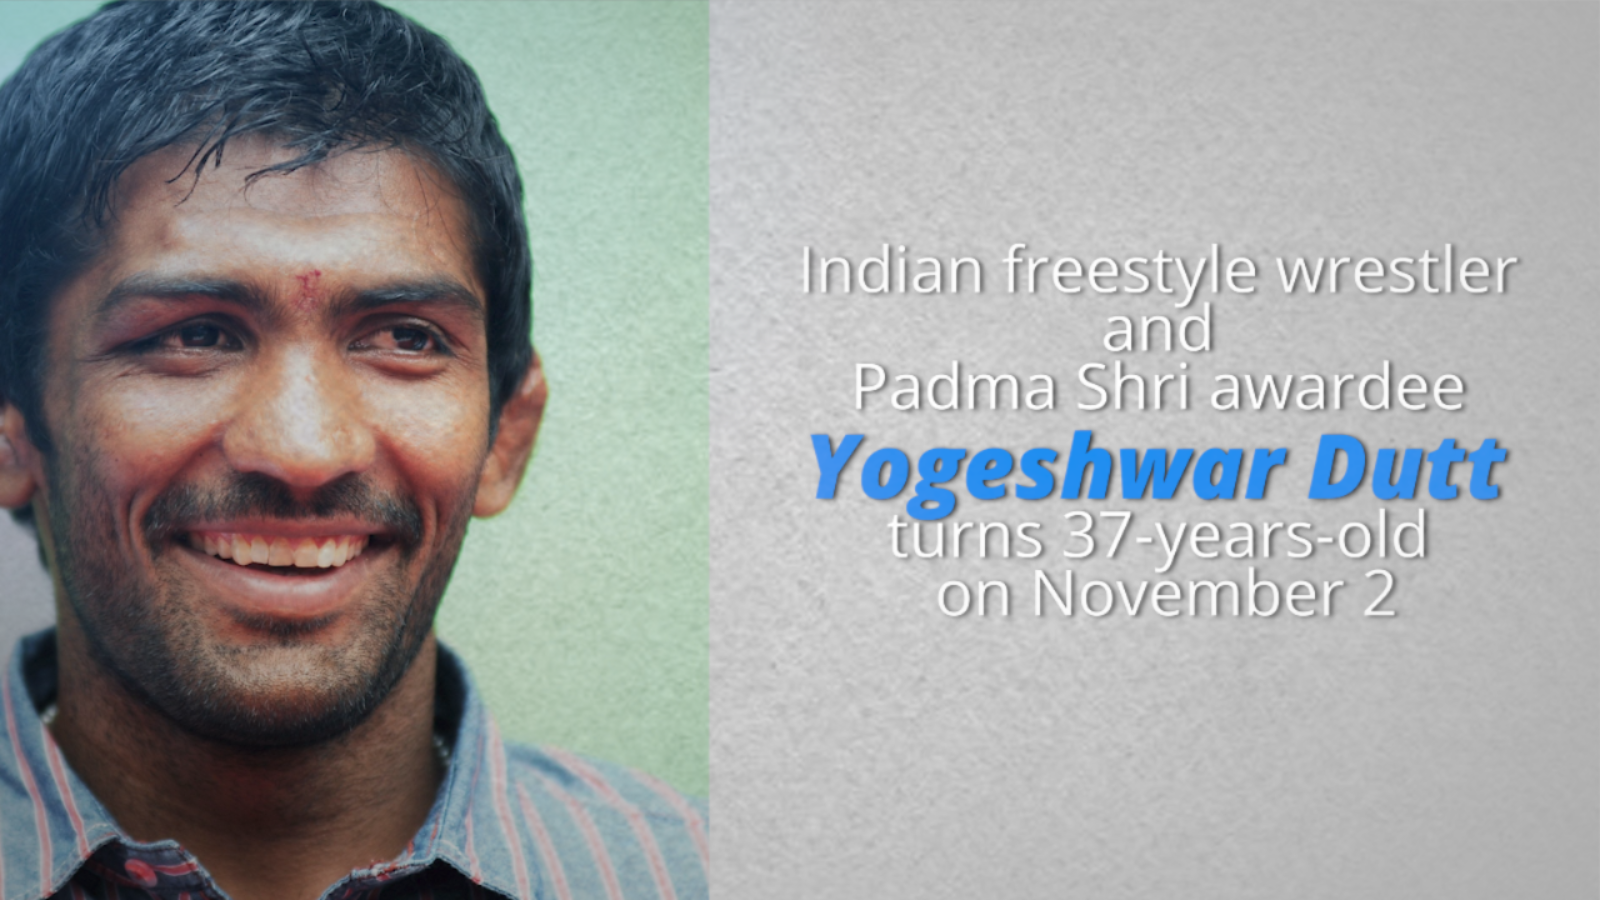 yogeshwar-dutt-pahalwan-ji-turns-37-years-old